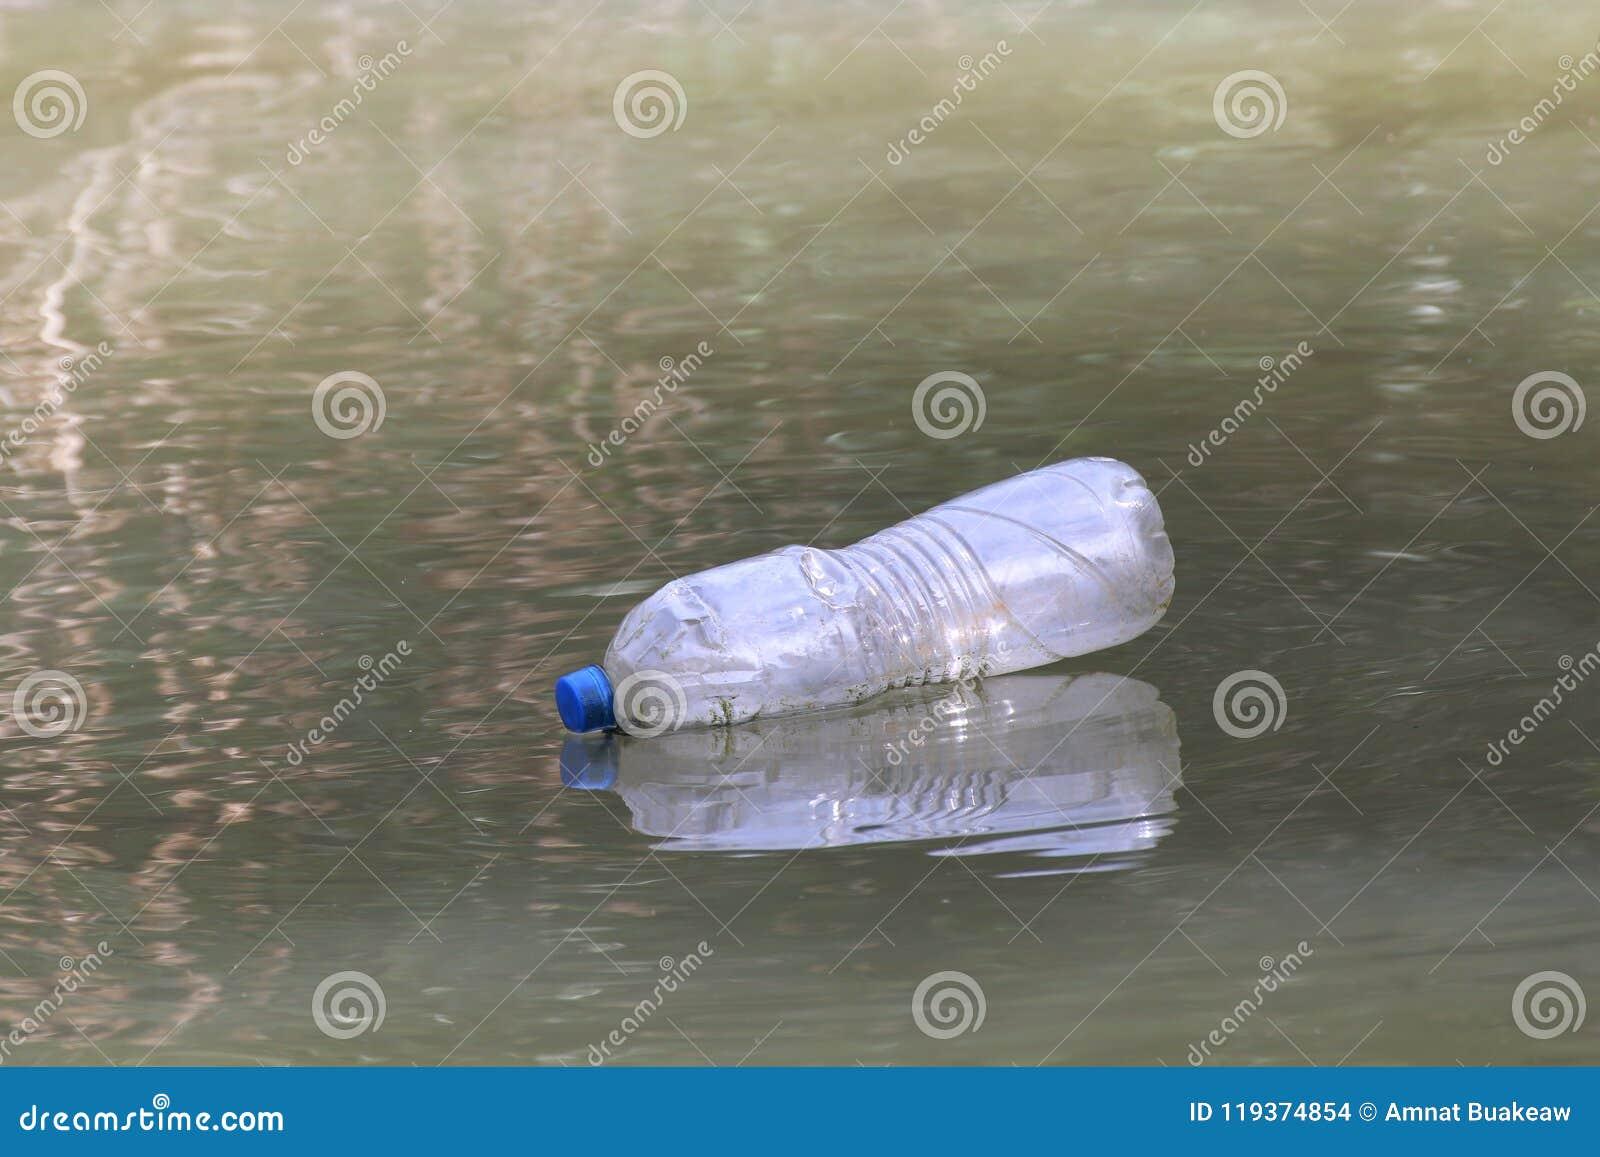 Desperdício plástico na superfície da água suja, água podre da garrafa, desperdício da garrafa